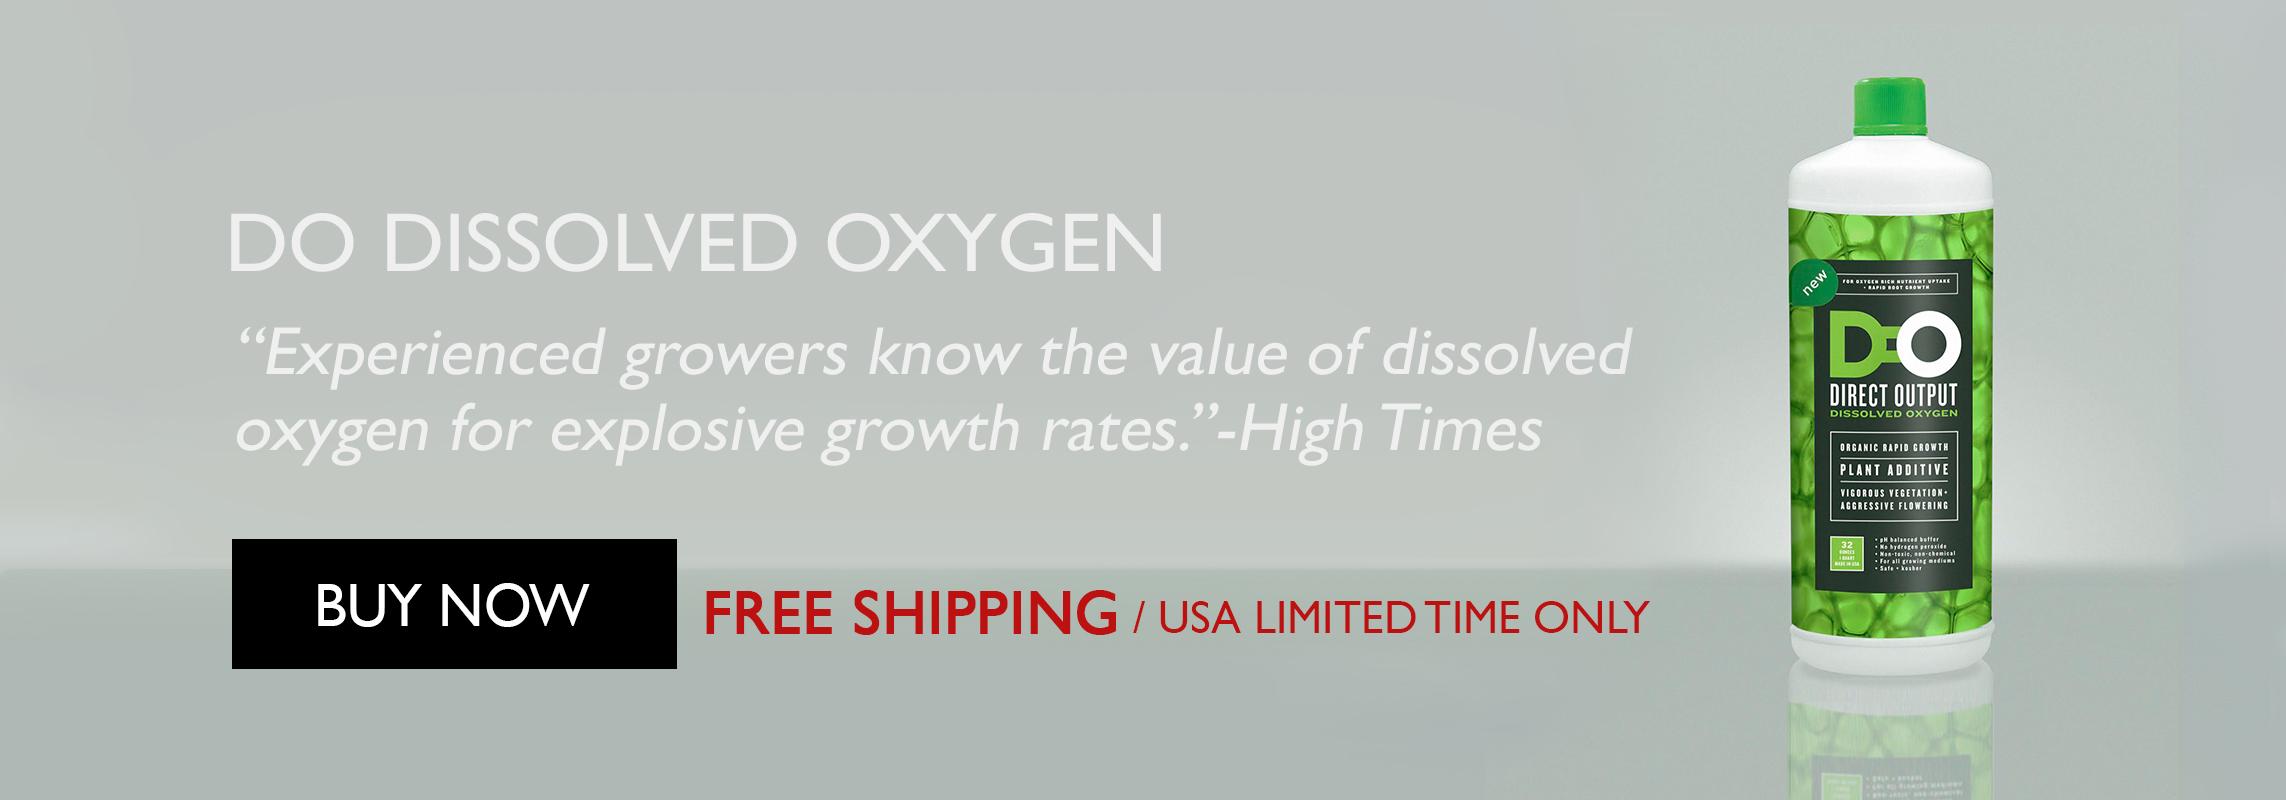 banner-do-dissolved-oxygen-plant-newyears.jpg